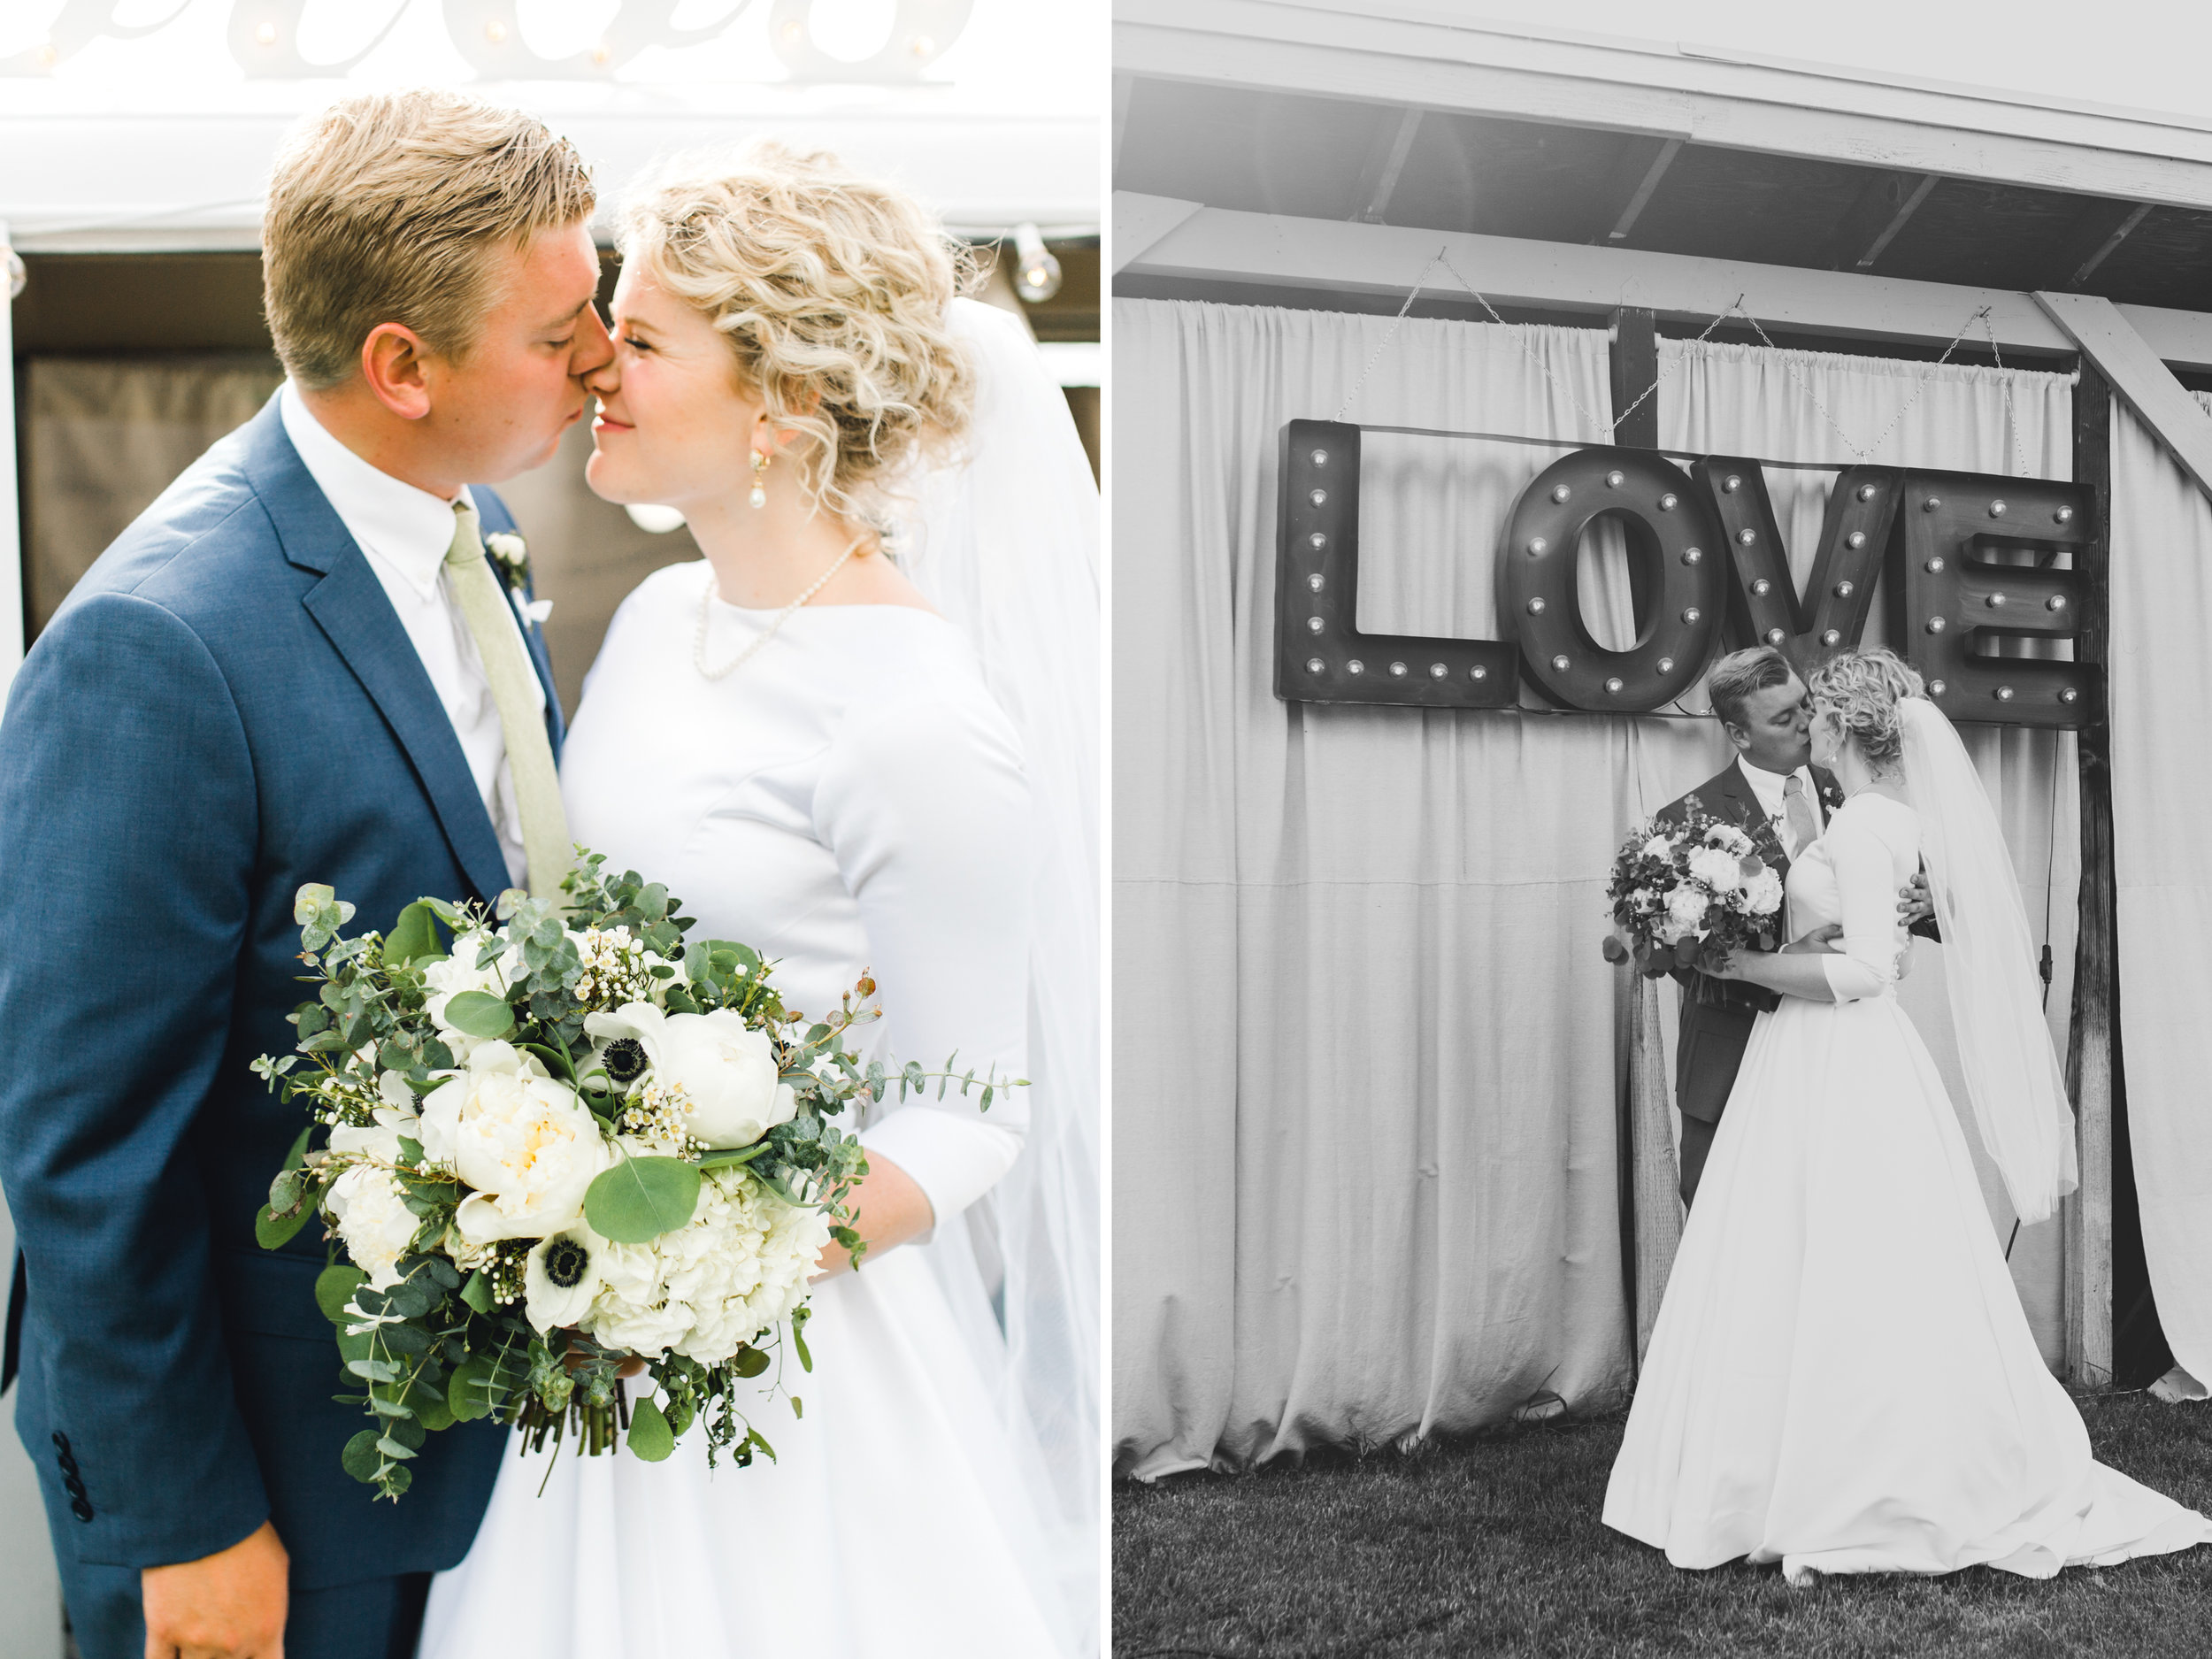 beautiful-outdoor-backyard-wedding-reception-anna-christine-photography-rexburg-idaho-5.jpg